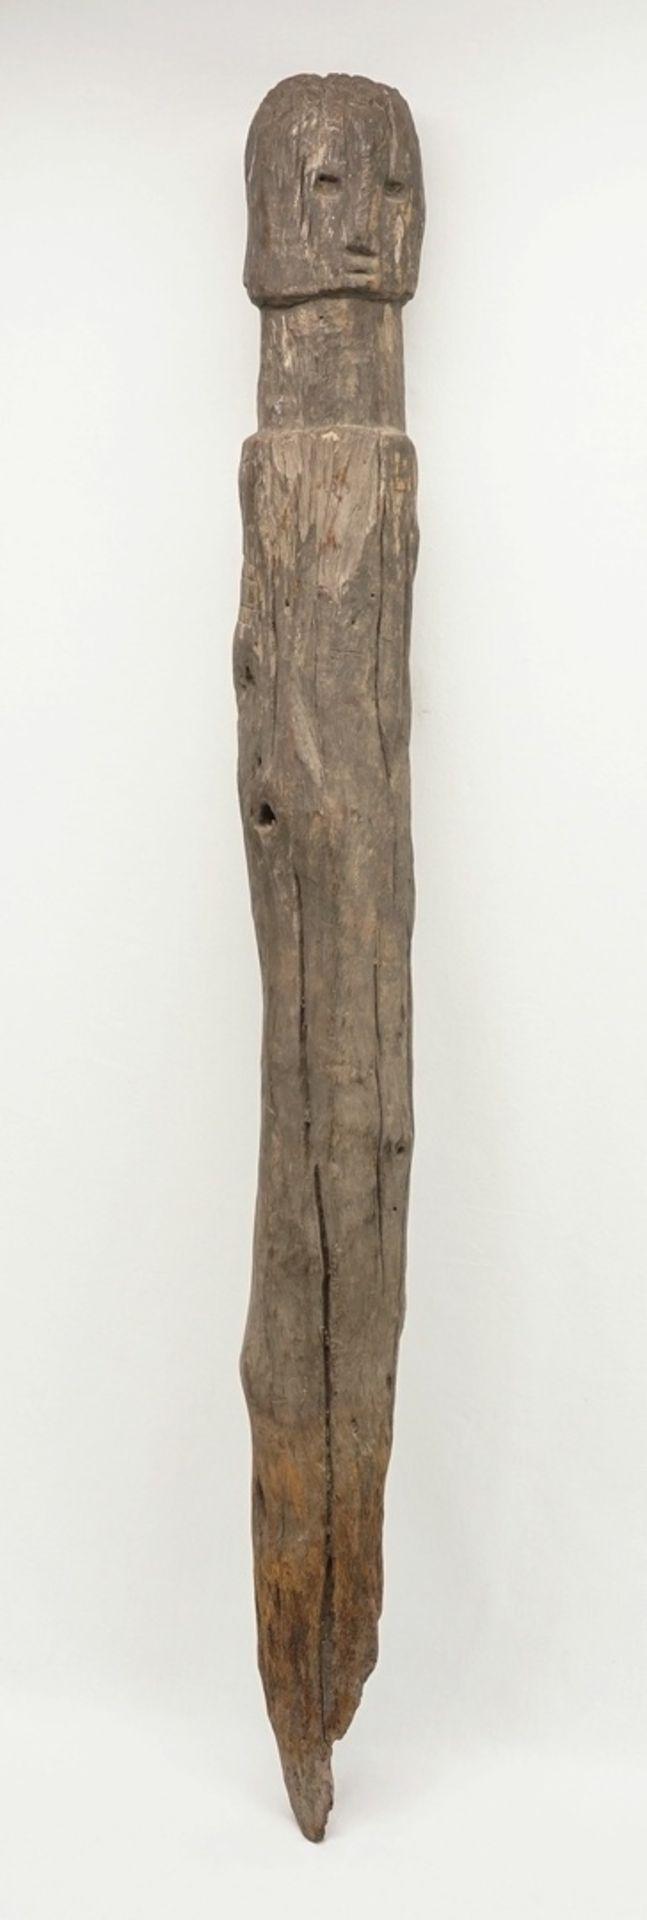 "Pfahlfigur ""bochio"", Benin, Fon"